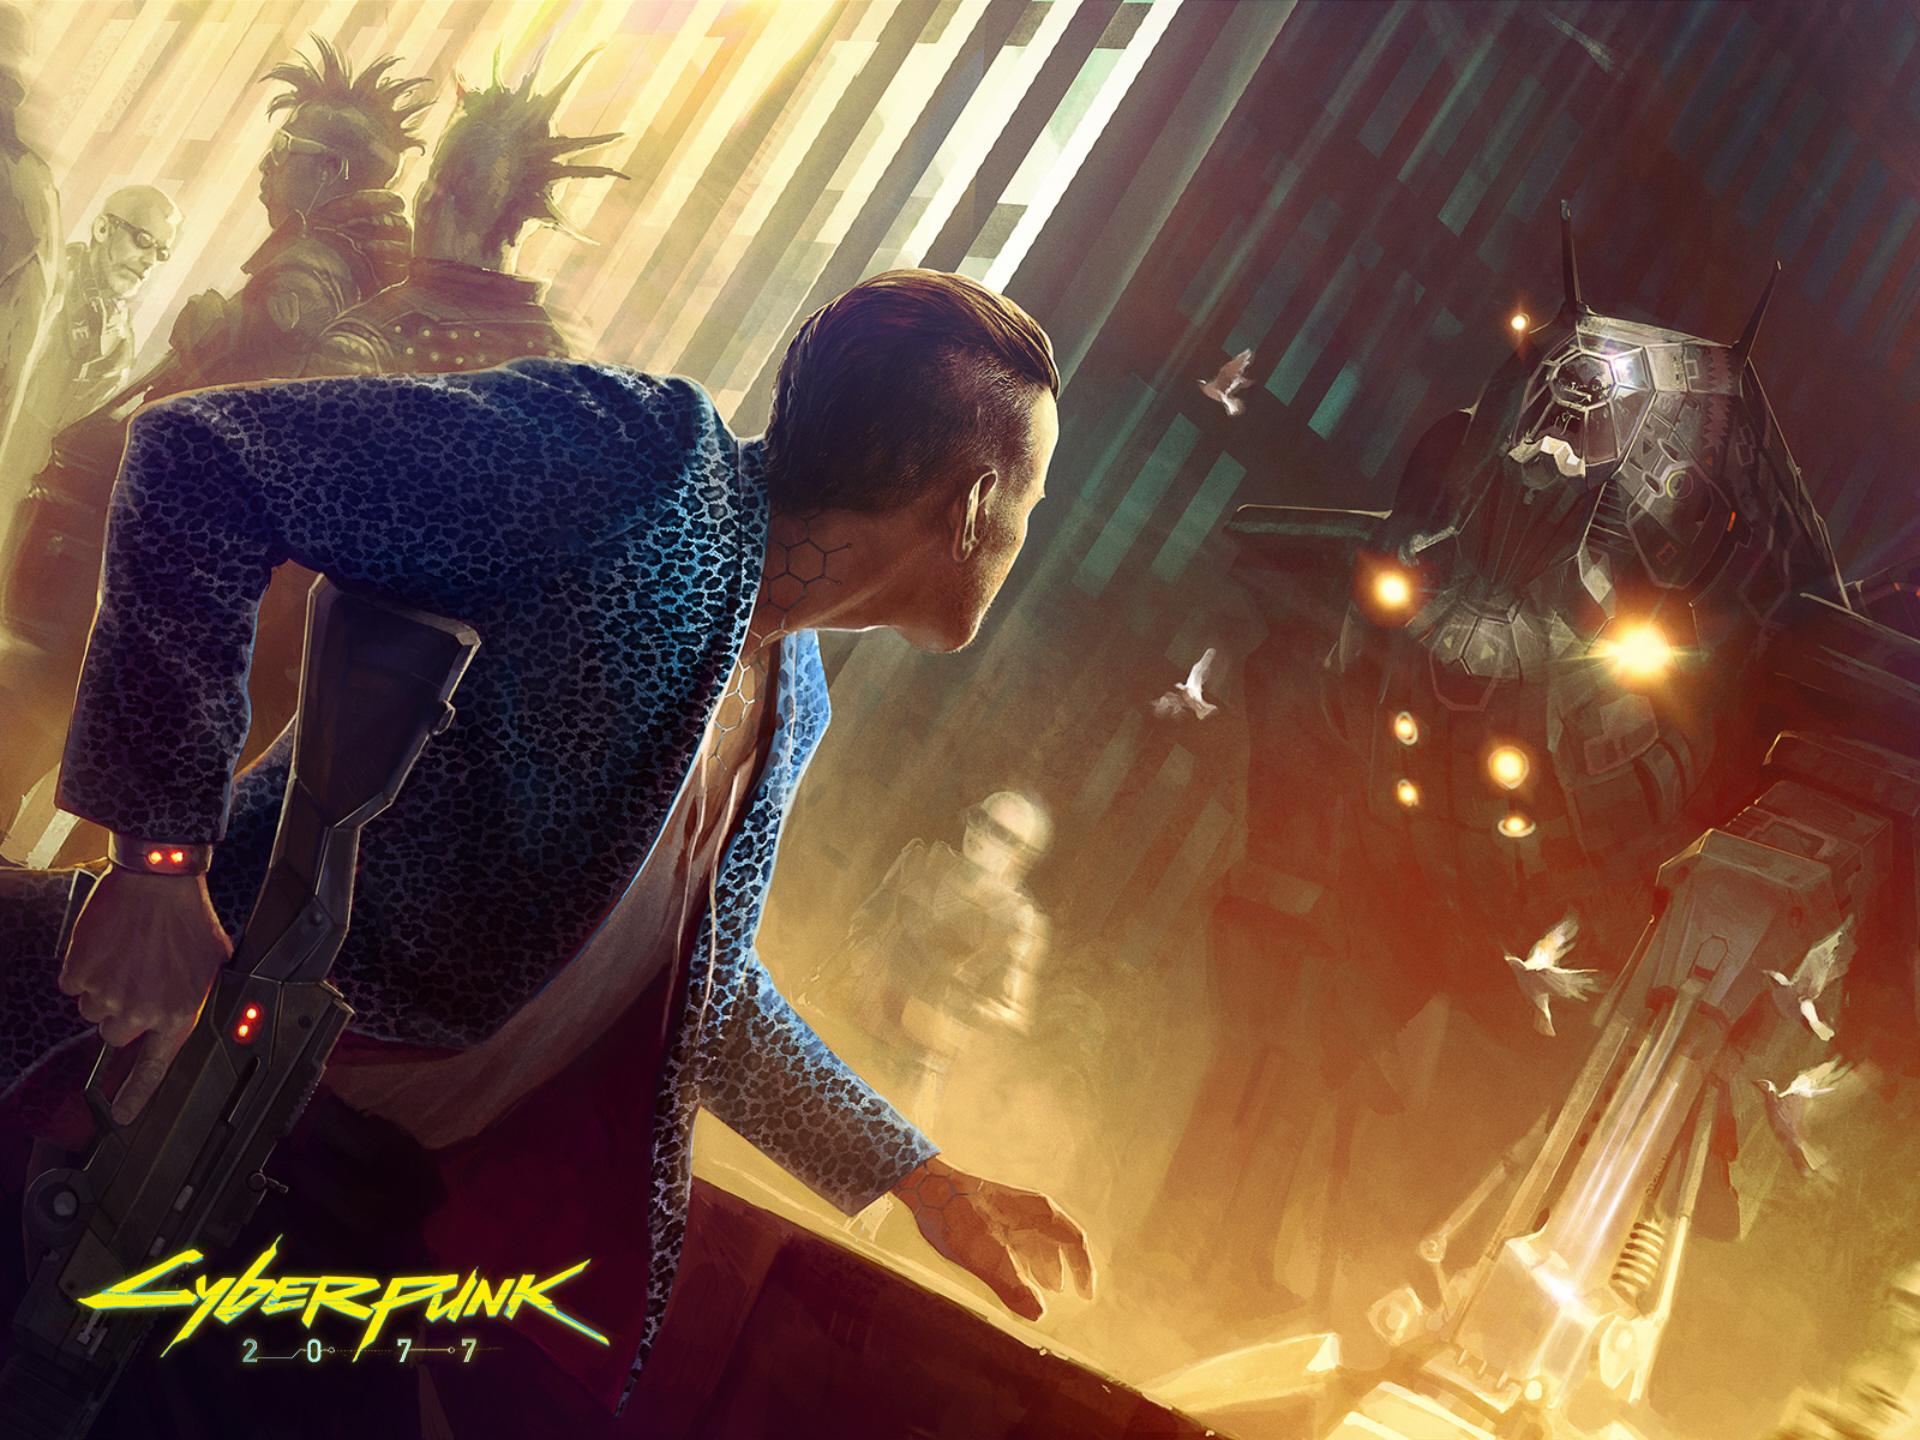 Cyberpunk 2077 Announced  New Sandbox Sci-Fi RPG From